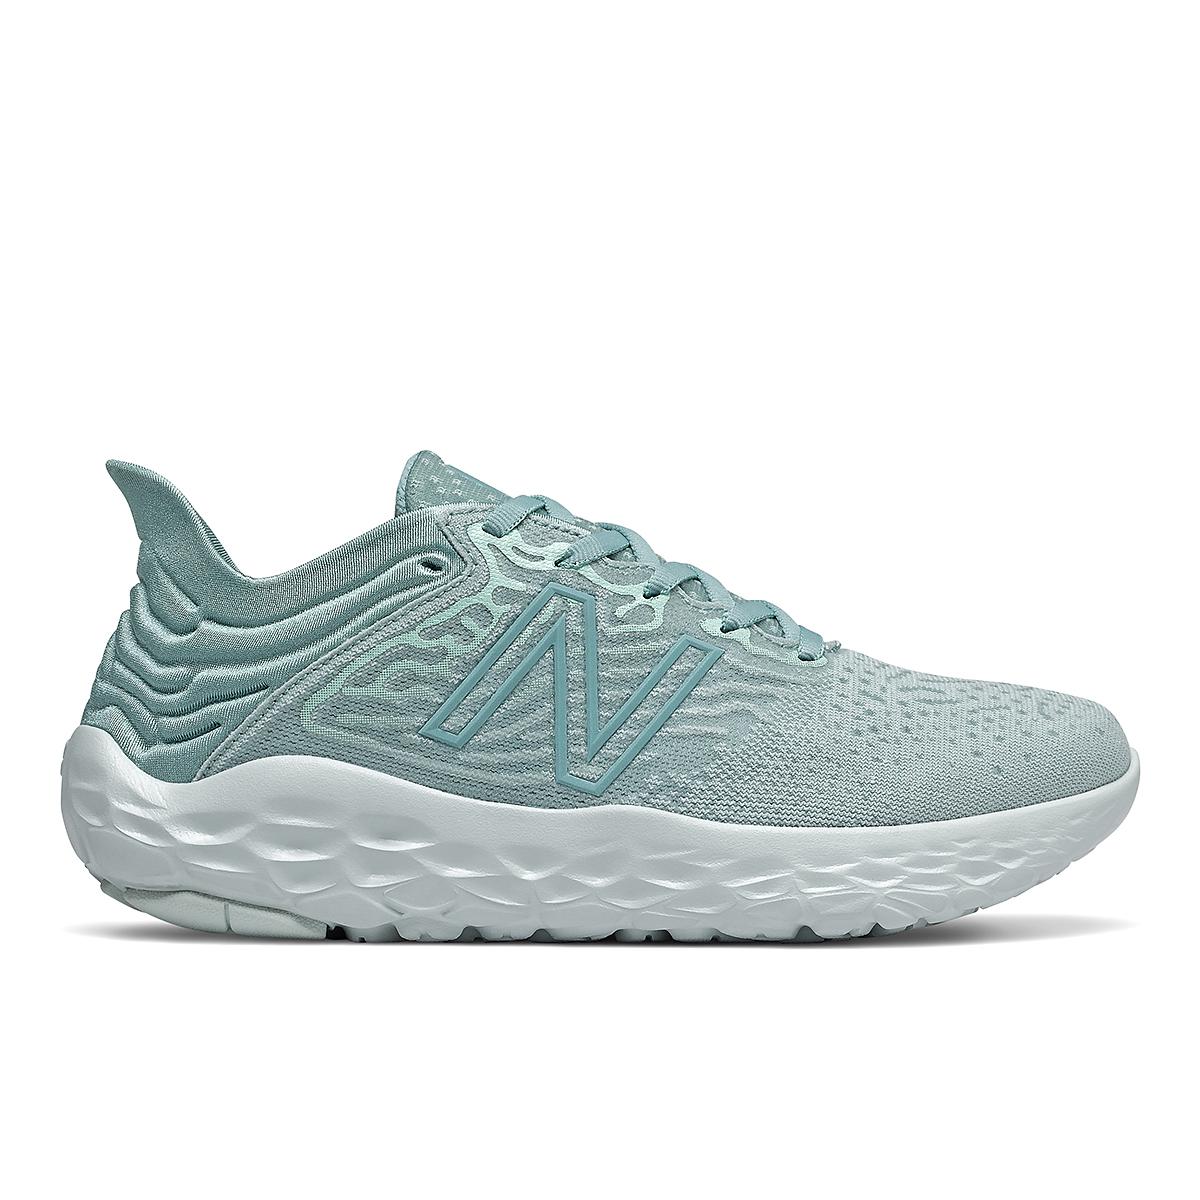 Women's New Balance Beacon V3 Running Shoe - Color: Storm Blue - Size: 5 - Width: Regular, Storm Blue, large, image 1